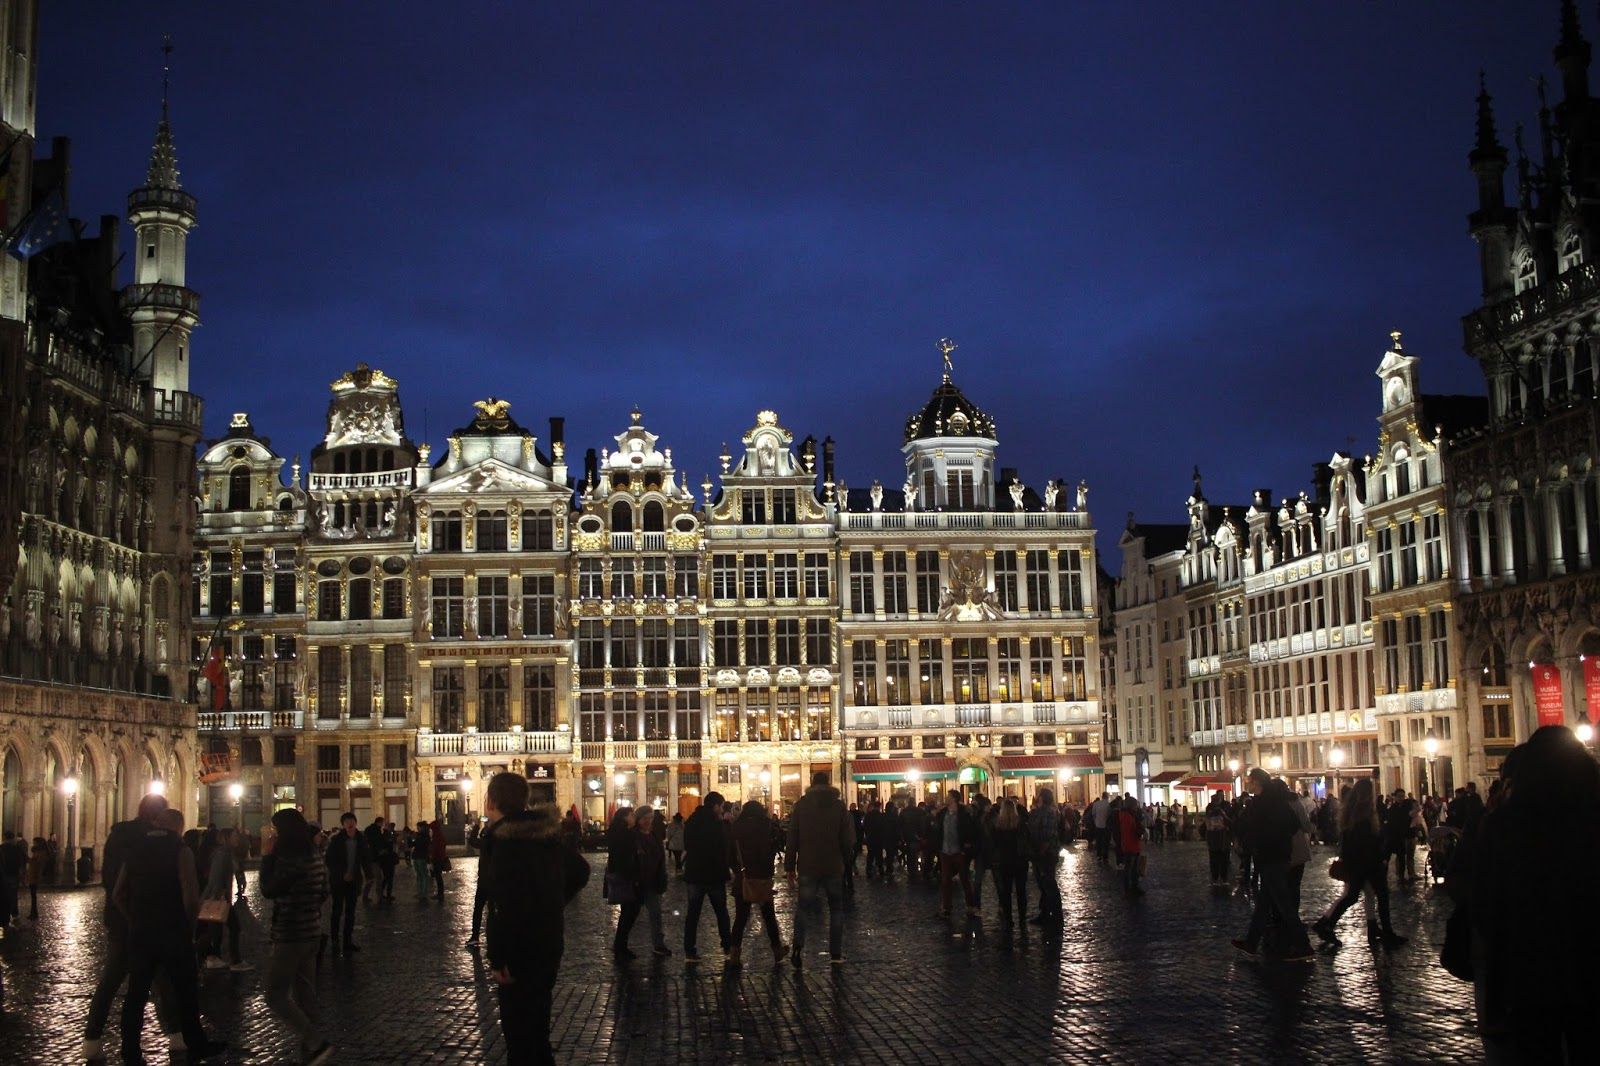 europa belgica